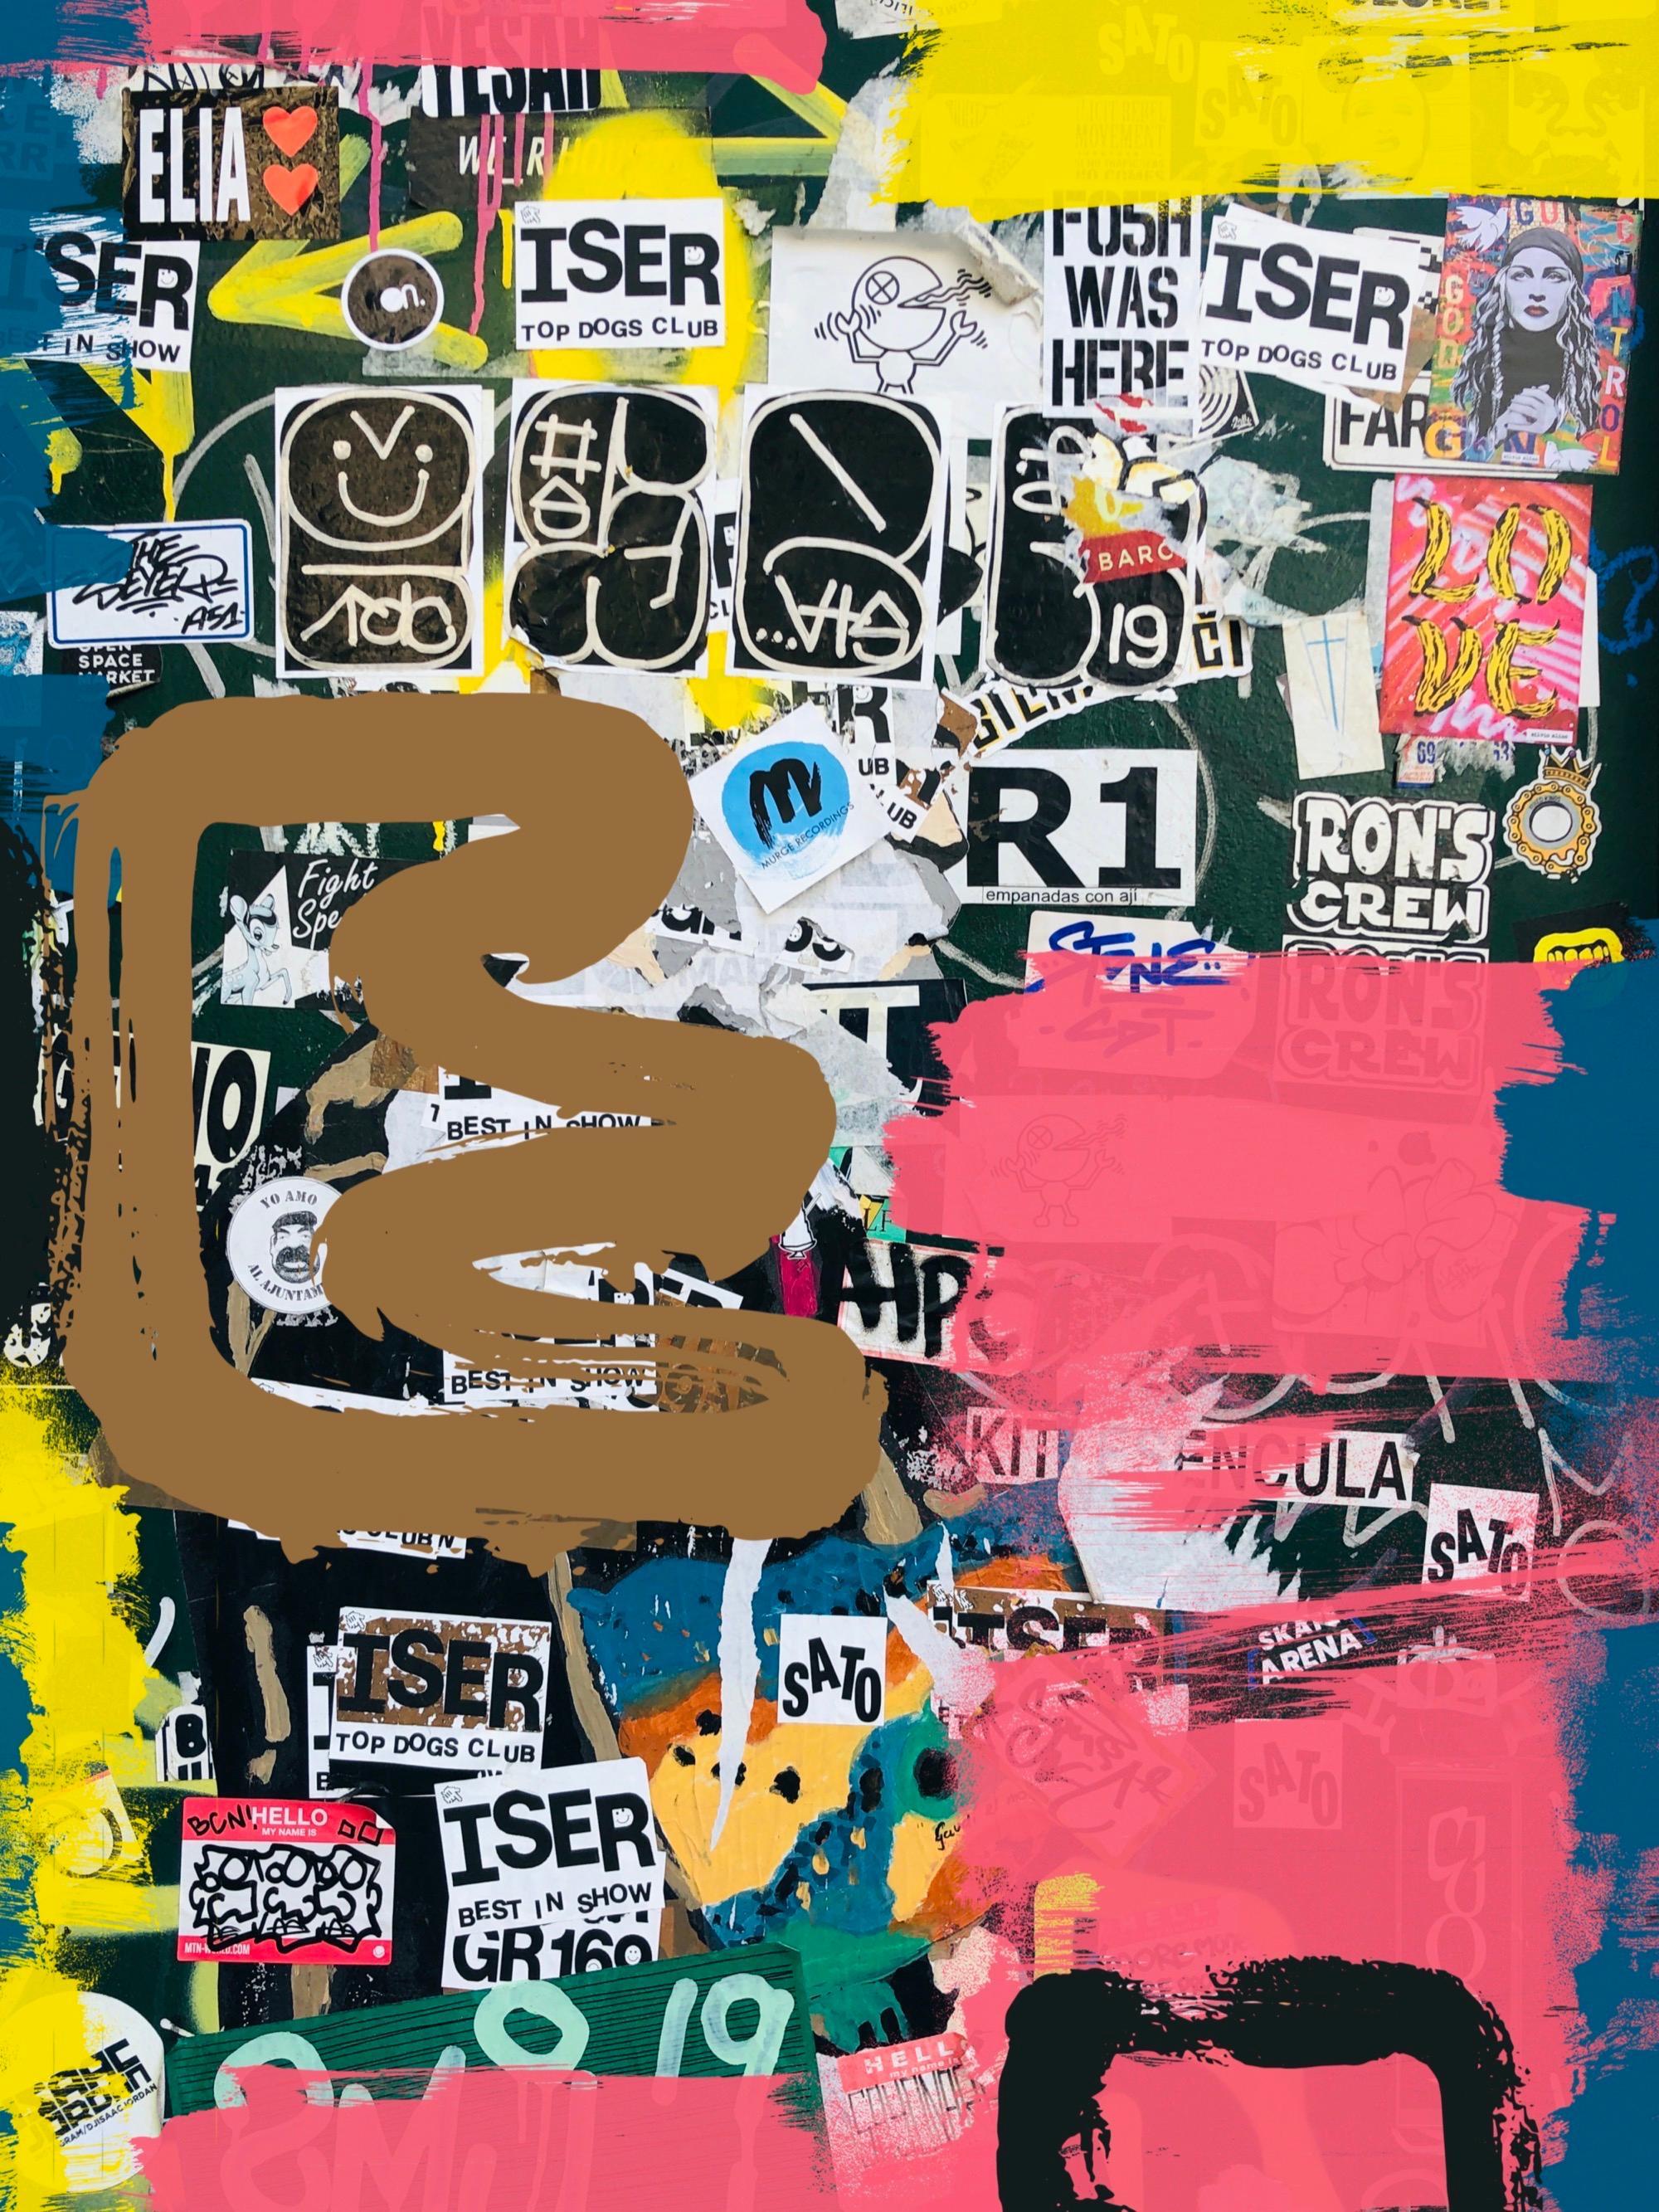 "Graffiti Street Art Mixed Medium on Canvas 45W x 60H"" Sort of thought"